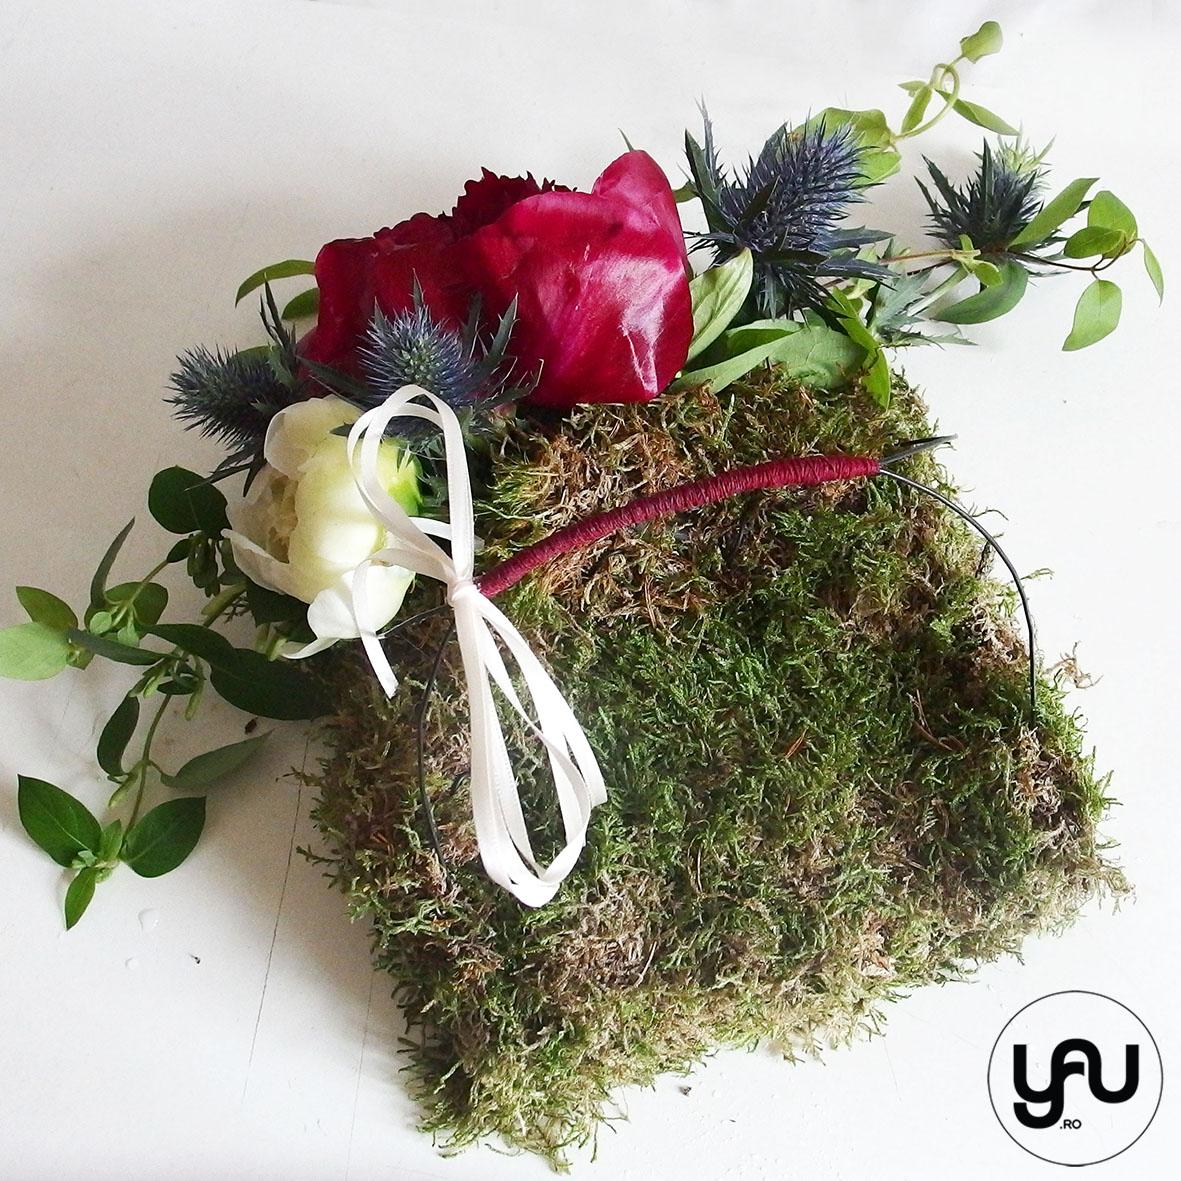 bujori-galbeni-_-yau-evenimente-2016-_-yau-concept-_-nunta-ambery-hall-_-elenatoader-12